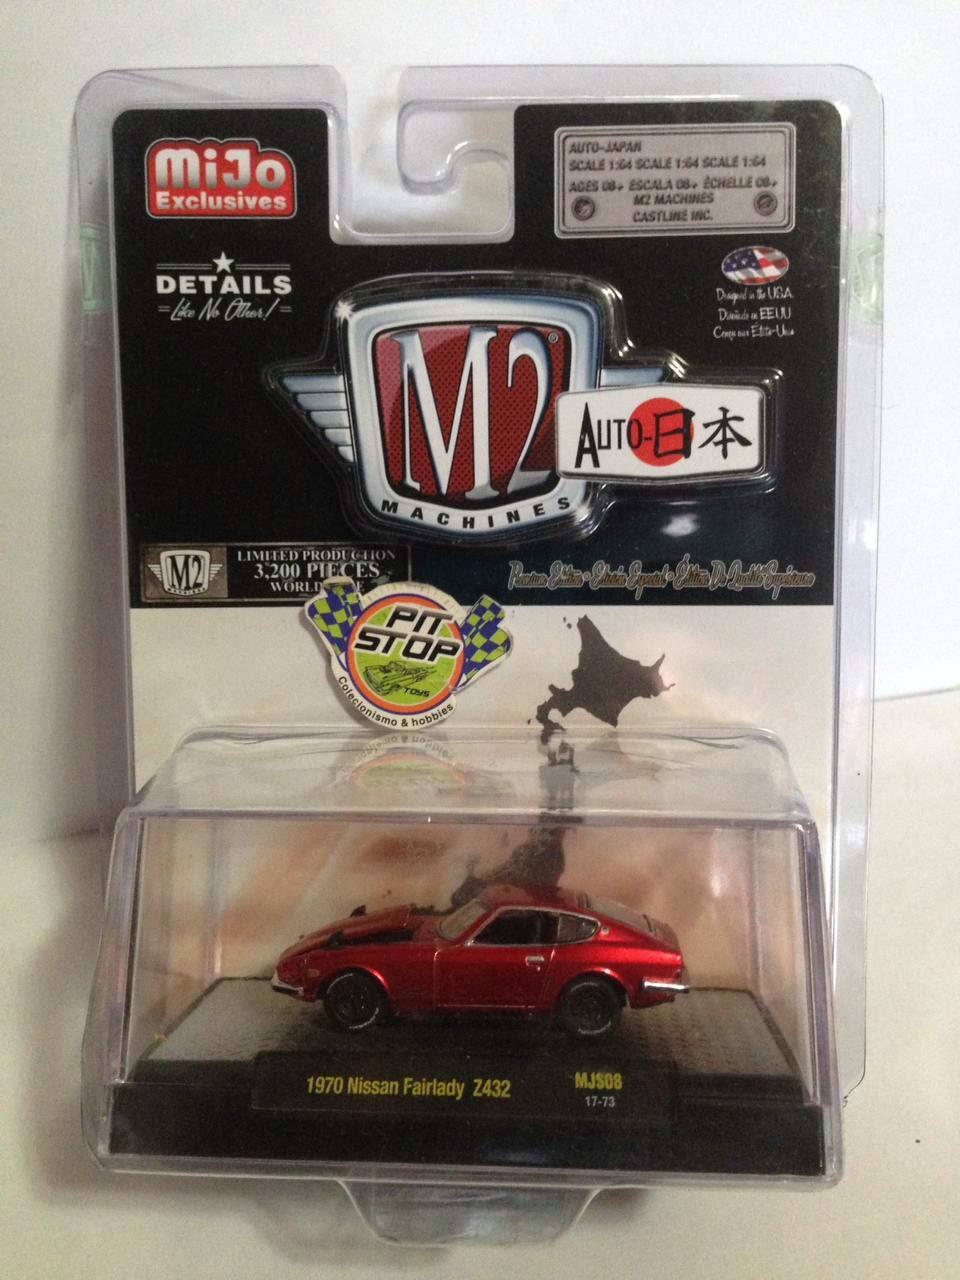 M2 Machines - 1970 Nissan Fairlady Vermelho - Auto Japan - MiJo Exclusives